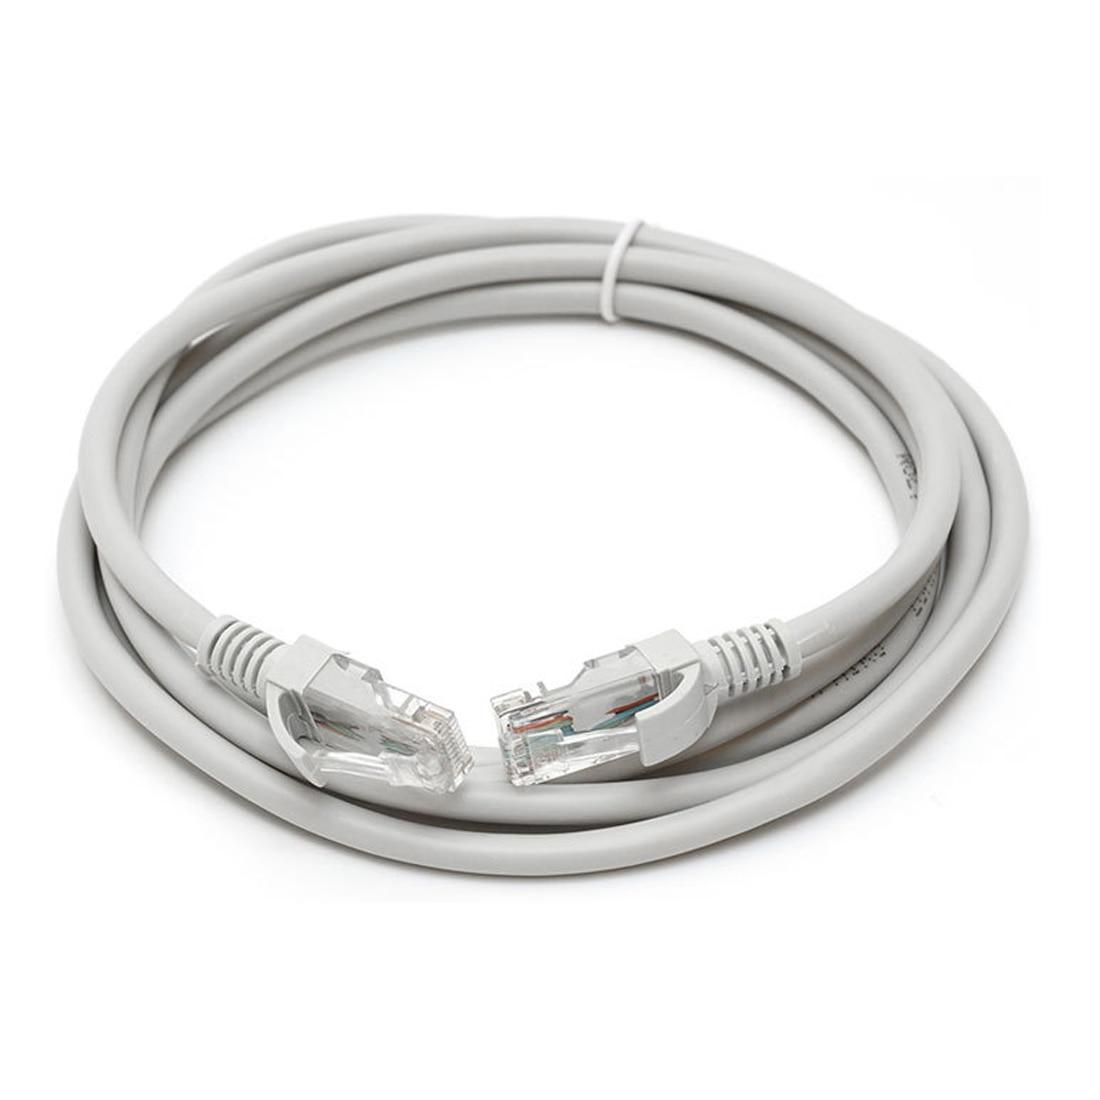 Marsnaska 1/1.5/2M 3M 5M 10M 15M 20M 25M 30M RJ45 Ethernet Cable for Cat5e Internet Network Patch LAN Cable Cord for PC Computer hdmi cable 2 0 1m 2m 3m 5m 10m 15m ethernet